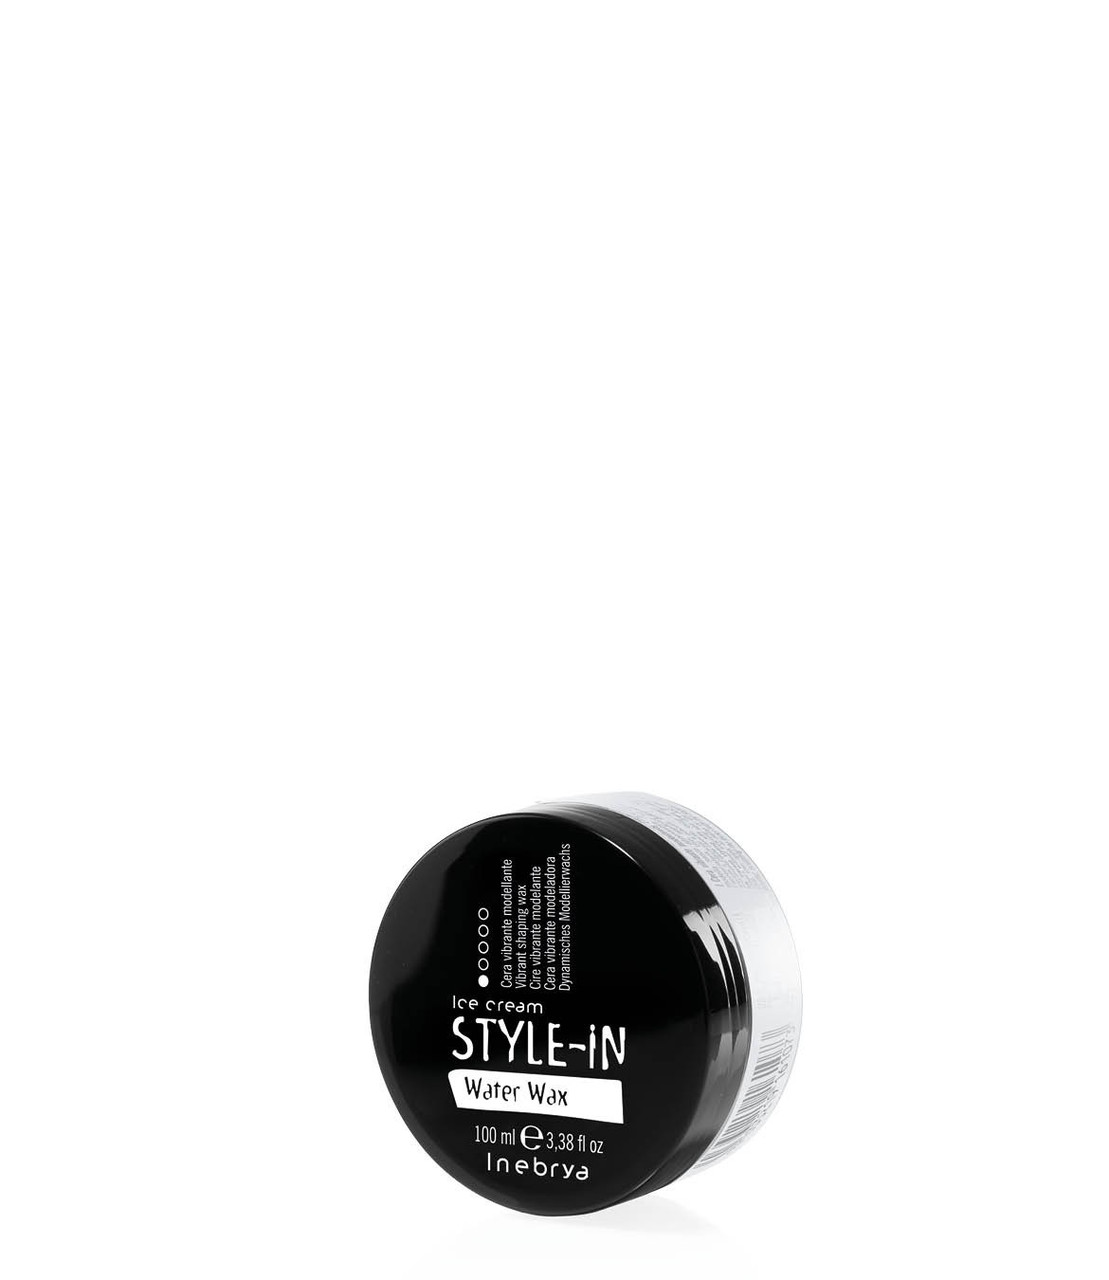 Моделирующий воск для укладки волос Inebrya Ice Cream Water Wax